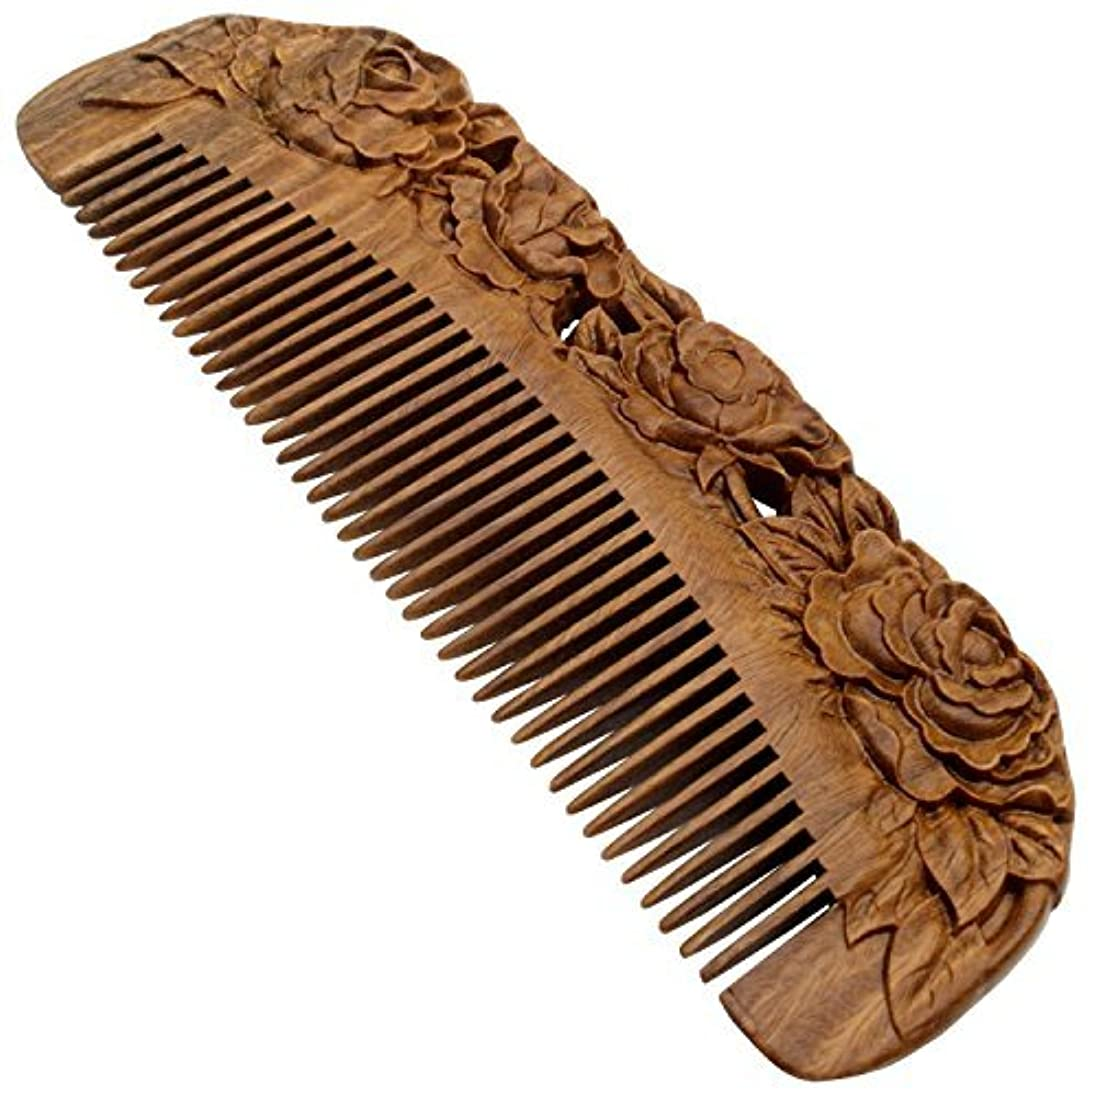 YOY Handmade Carved Natural Sandalwood Hair Comb - Anti-static No Snag Brush for Men's Mustache Beard Care Anti...